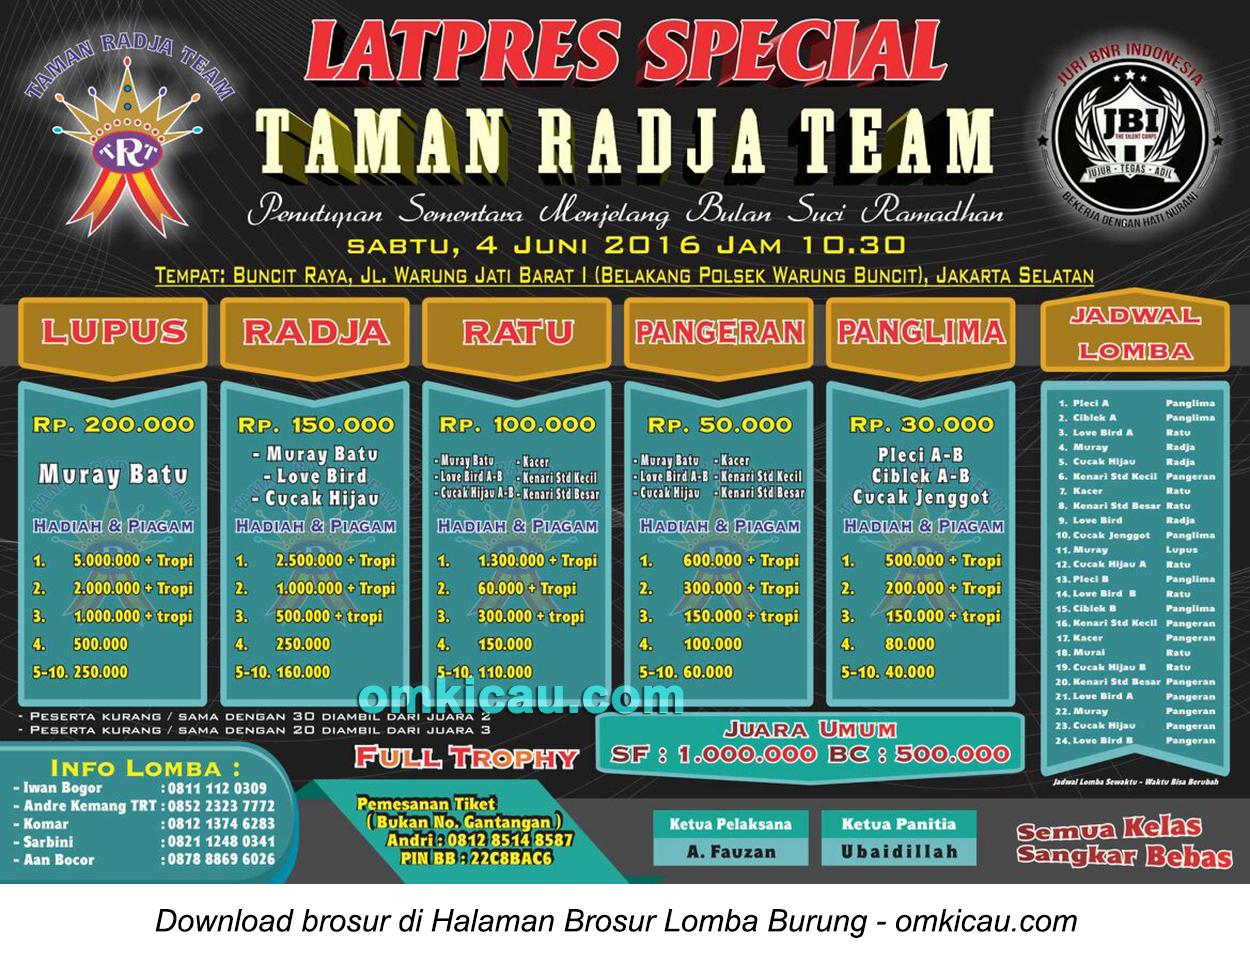 Brosur Latpres Special Taman Radja Team, Jakarta Selatan, 4 Juni 2016